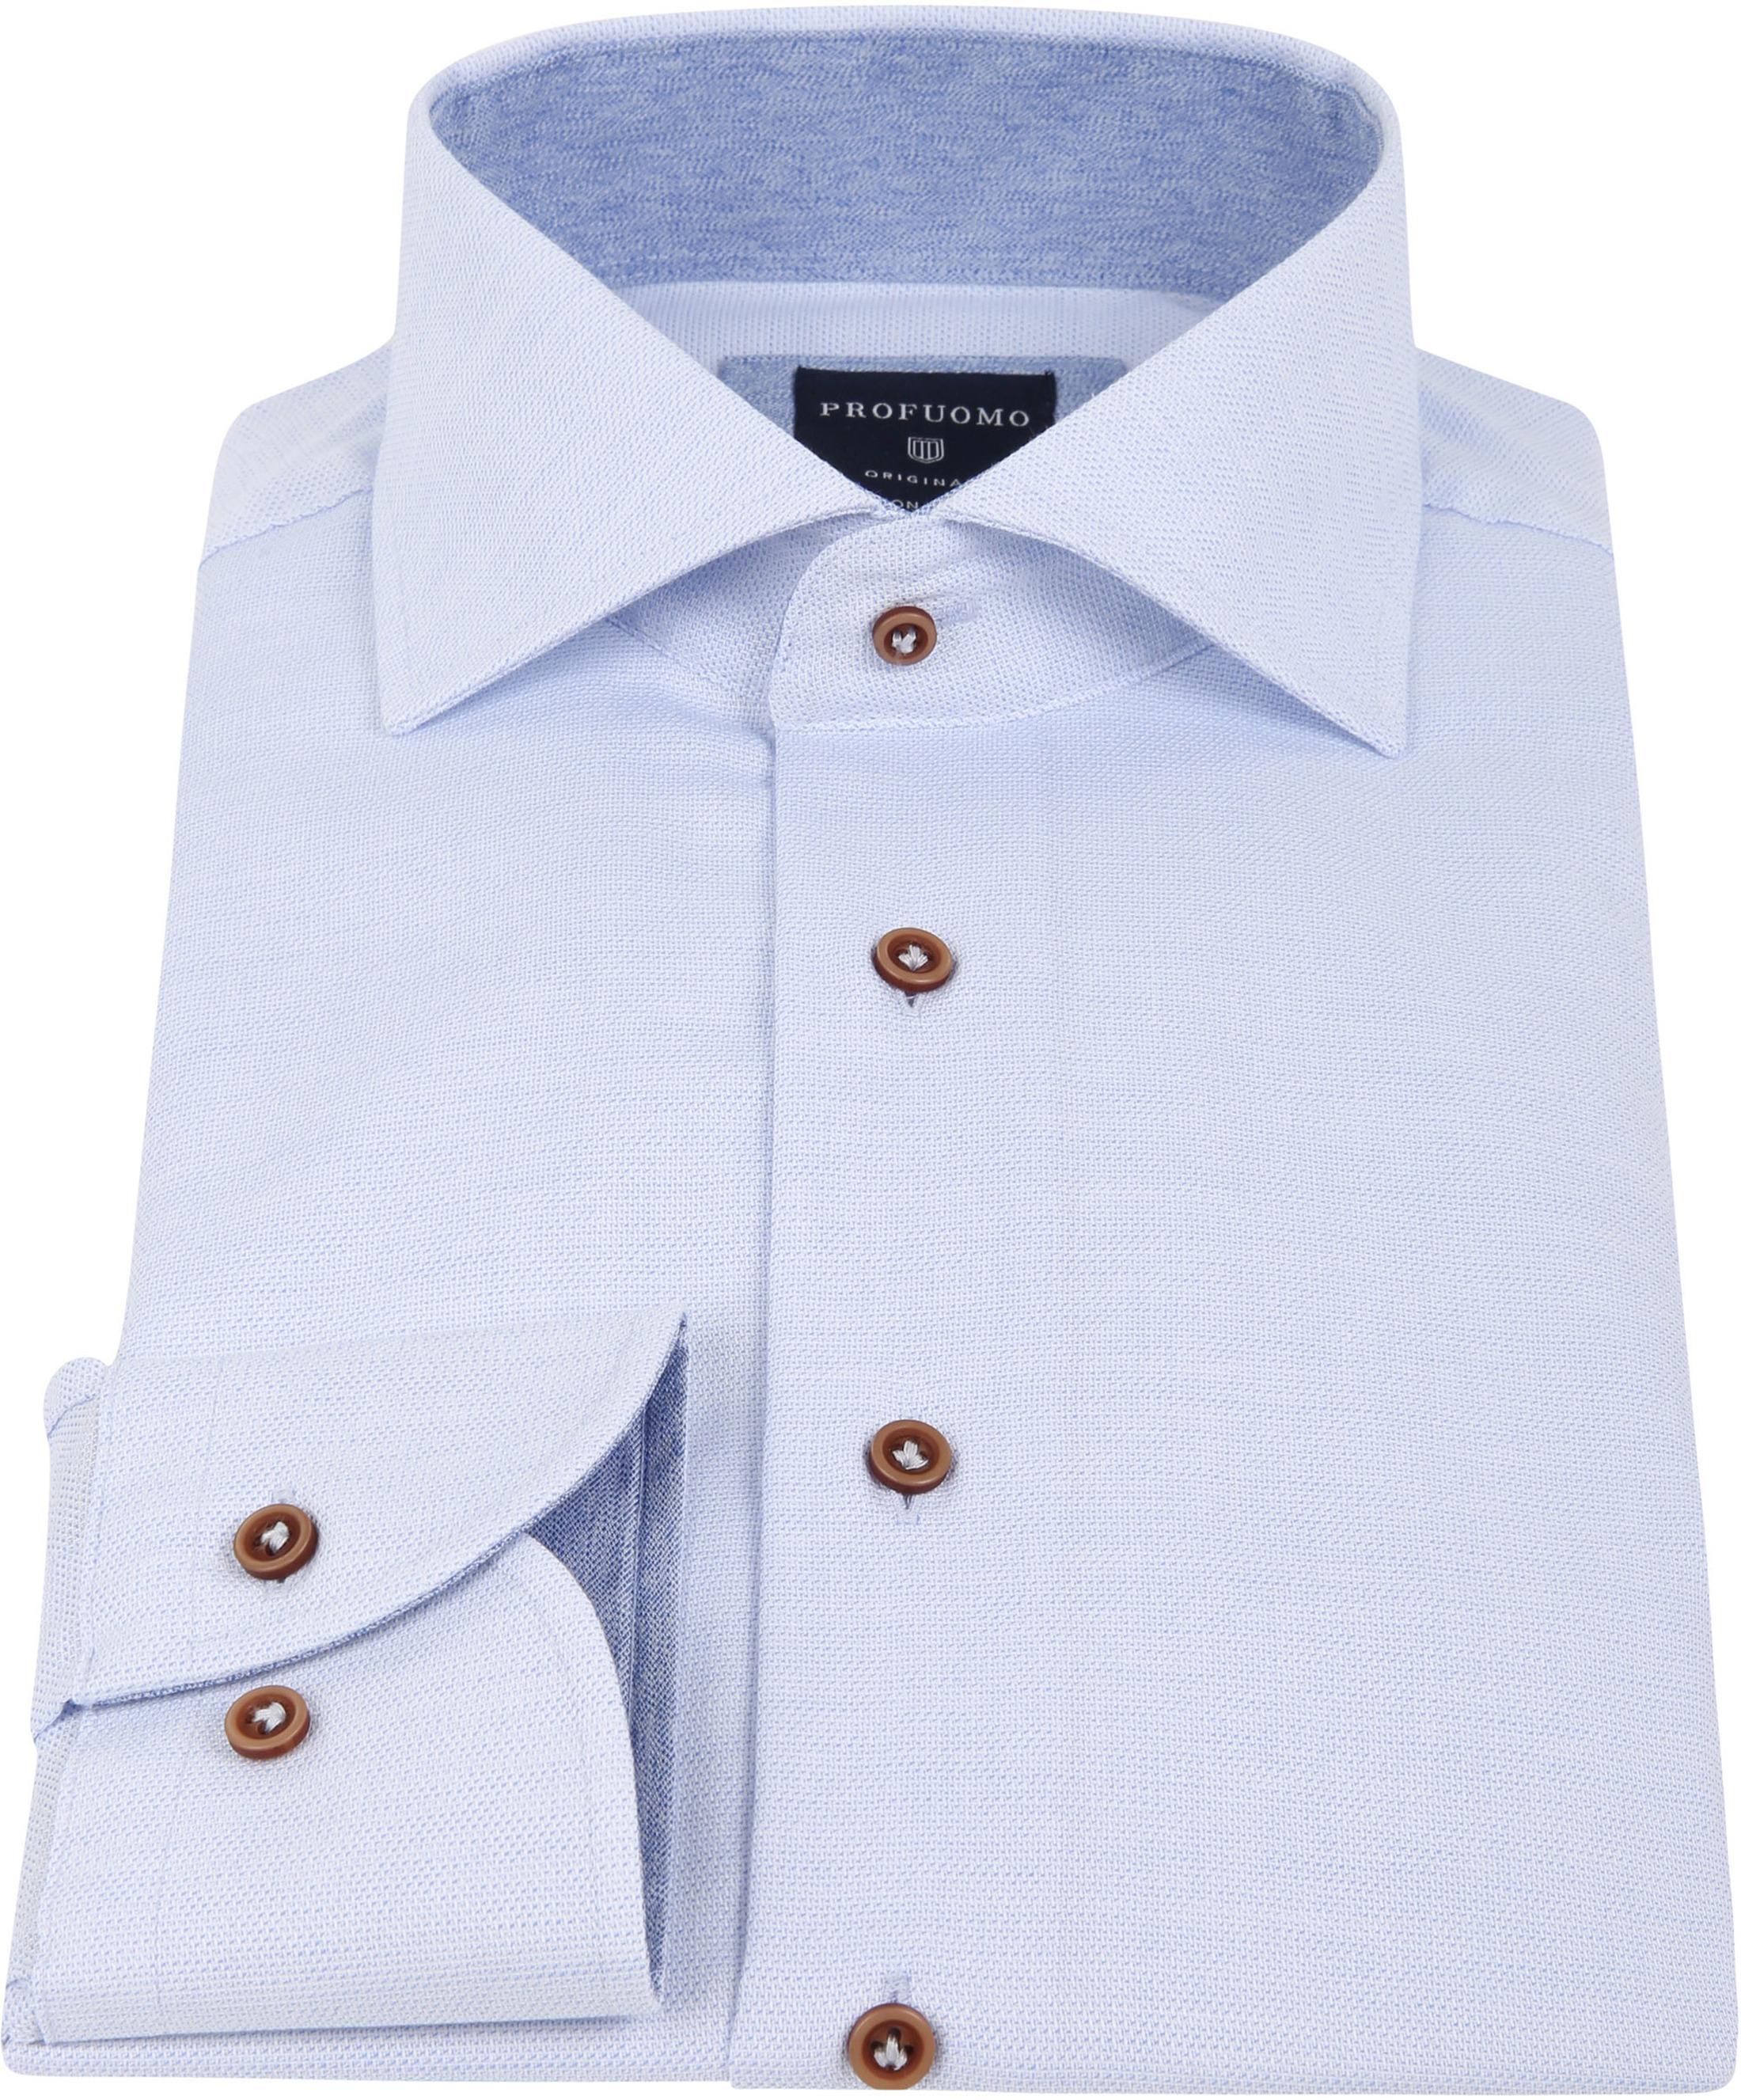 Profuomo Shirt Blue SF foto 2